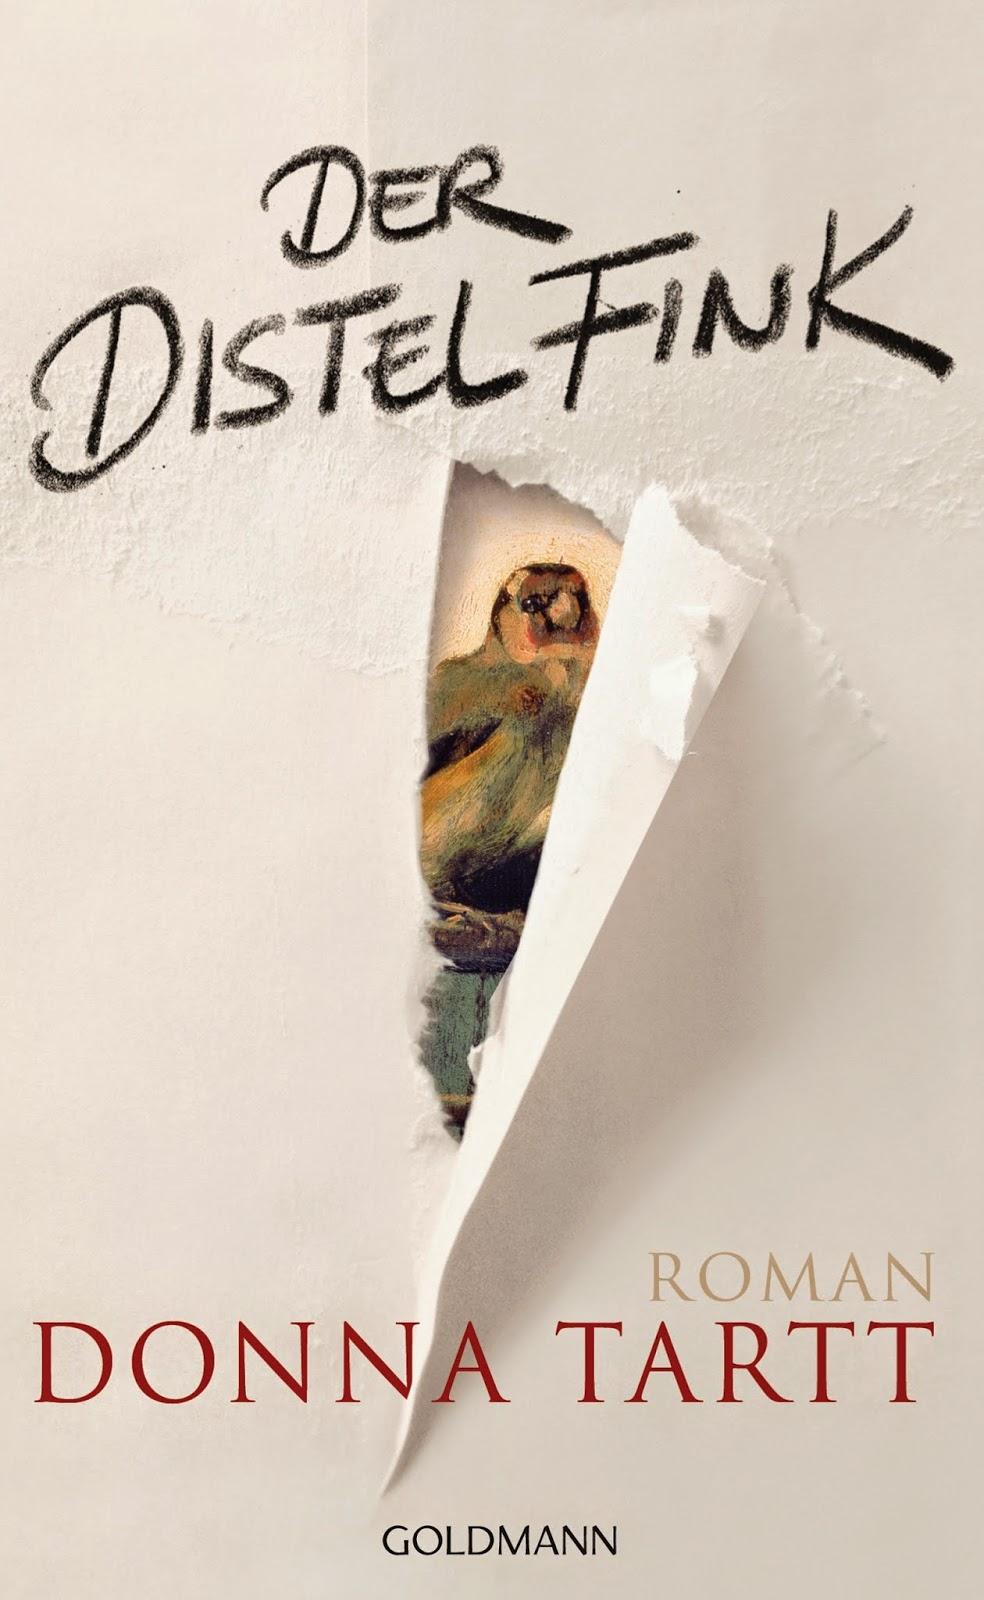 http://www.randomhouse.de/Presse/Buch/Der-Distelfink-Roman/Donna-Tartt/pr329986.rhd?pub=4000&men=783&mid=5